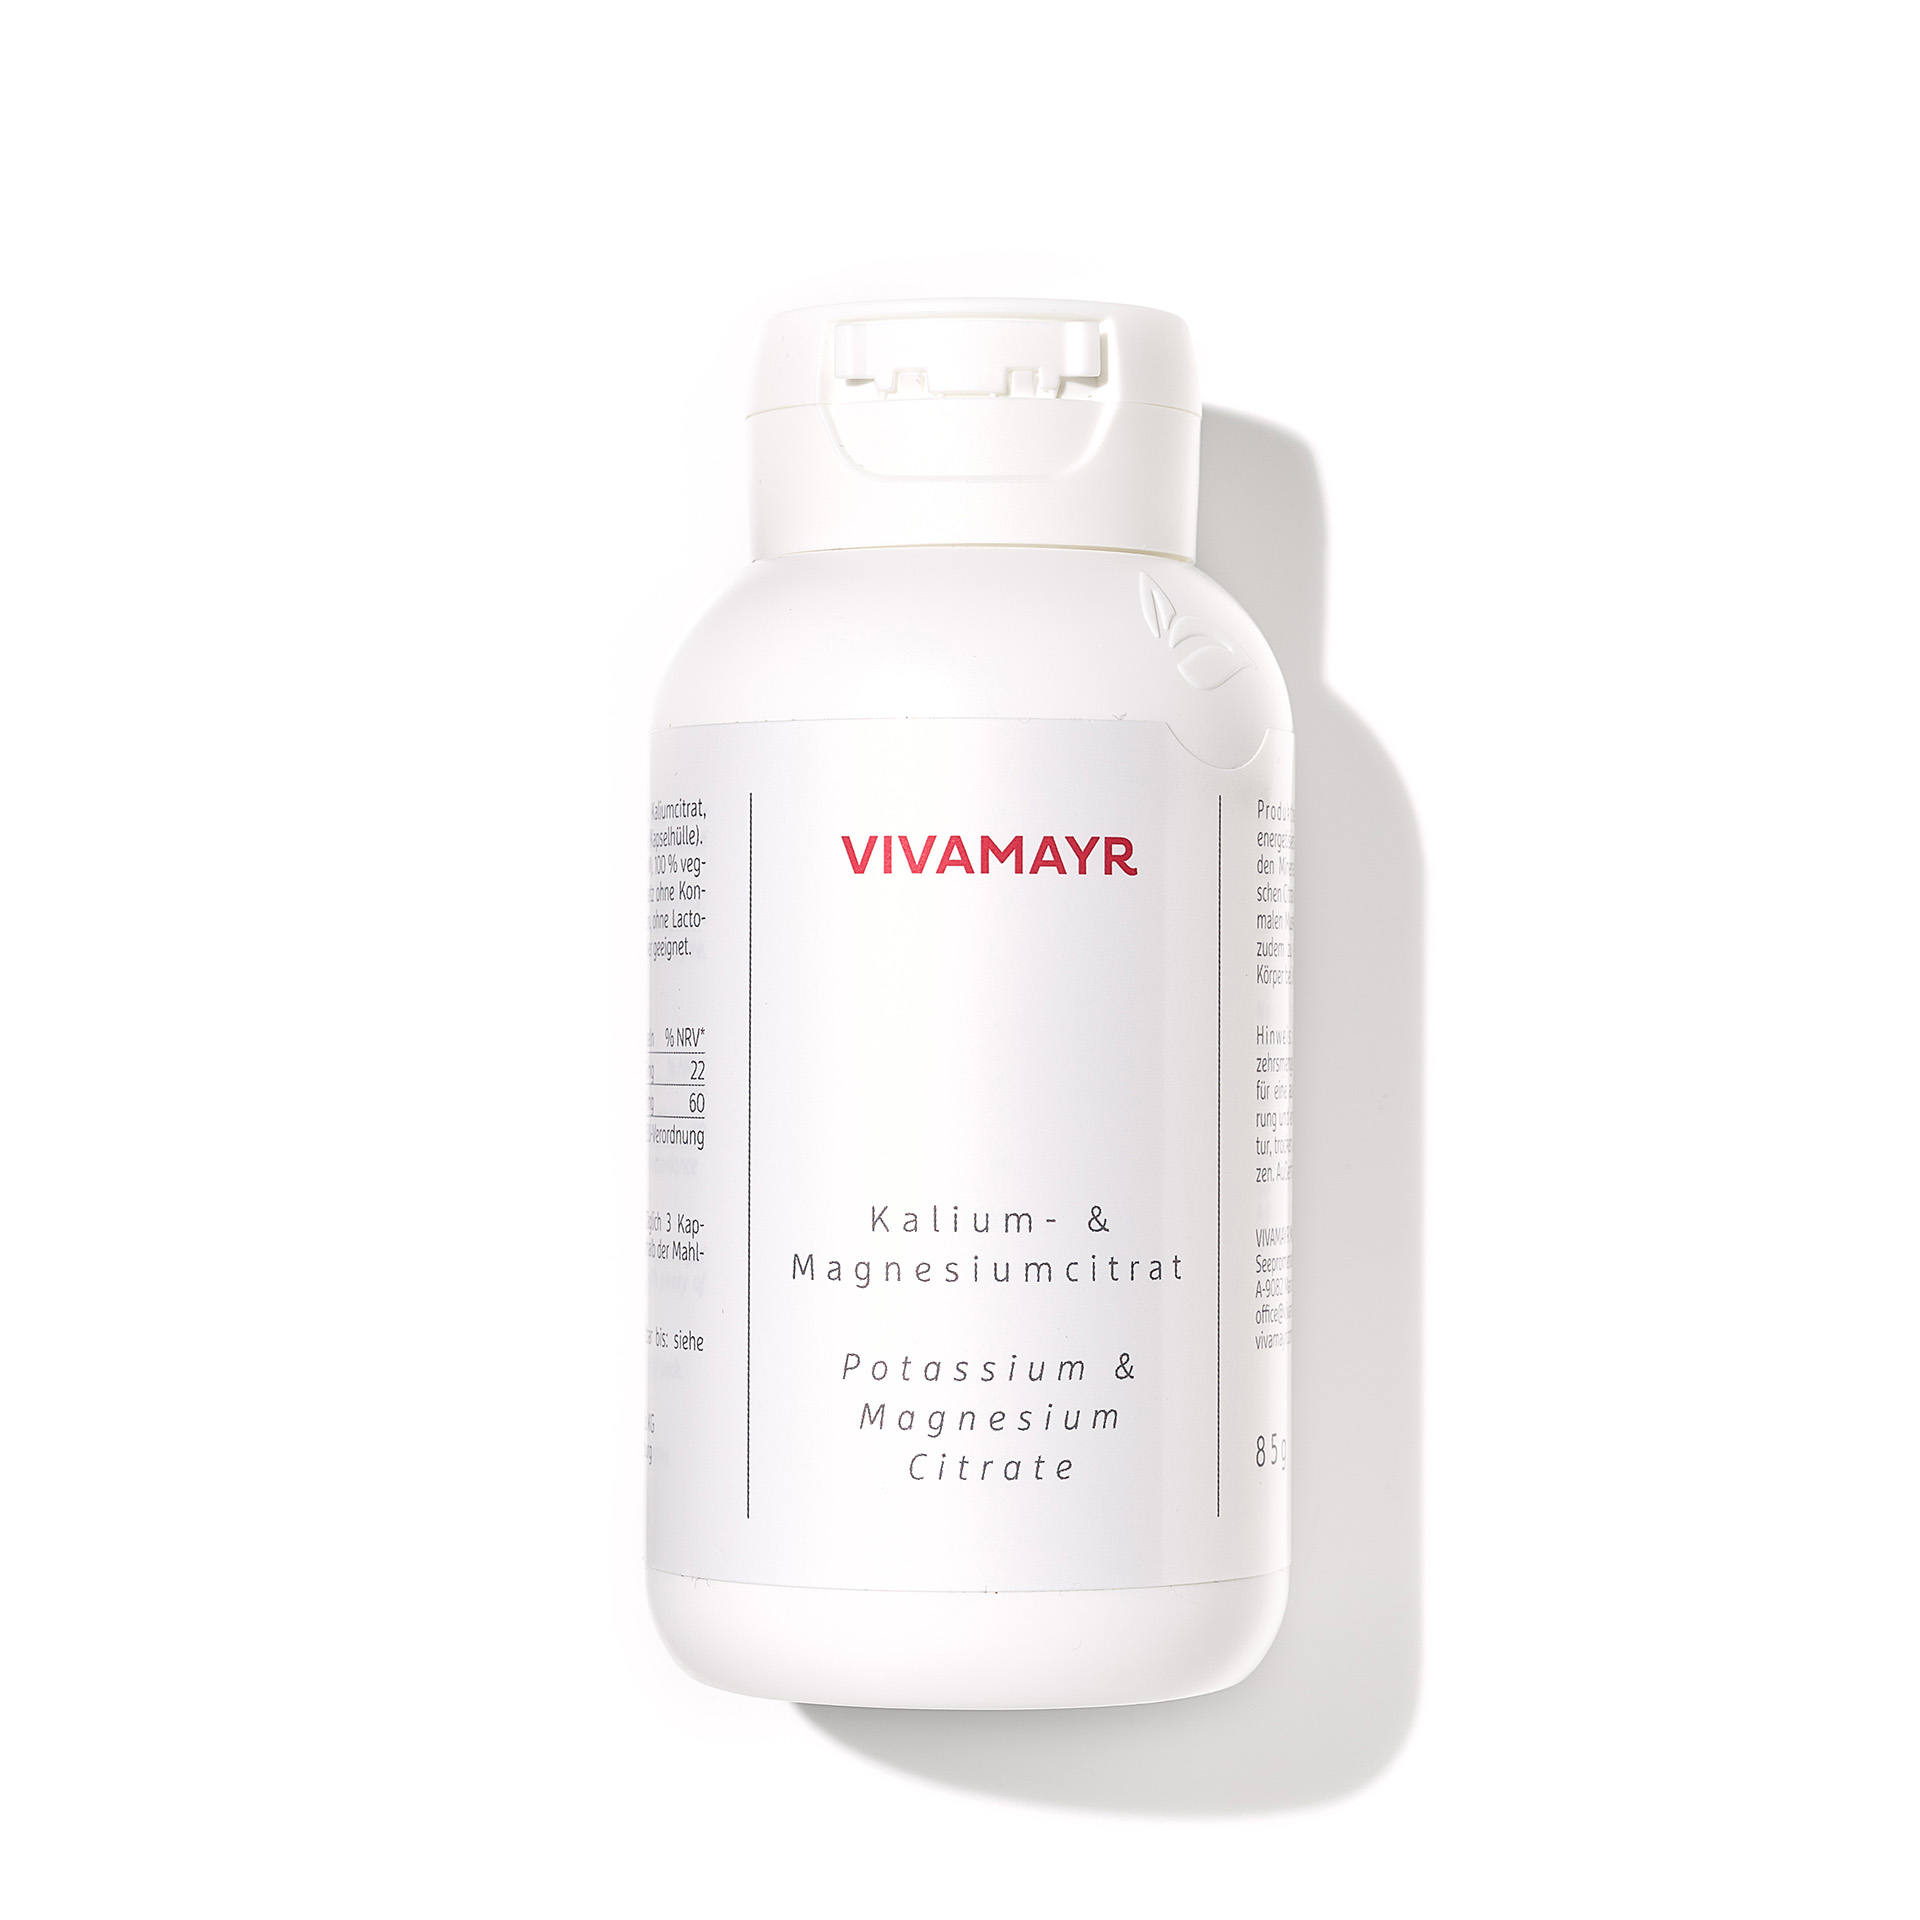 VIVAMAYR Kalium Magnesiumcitrat